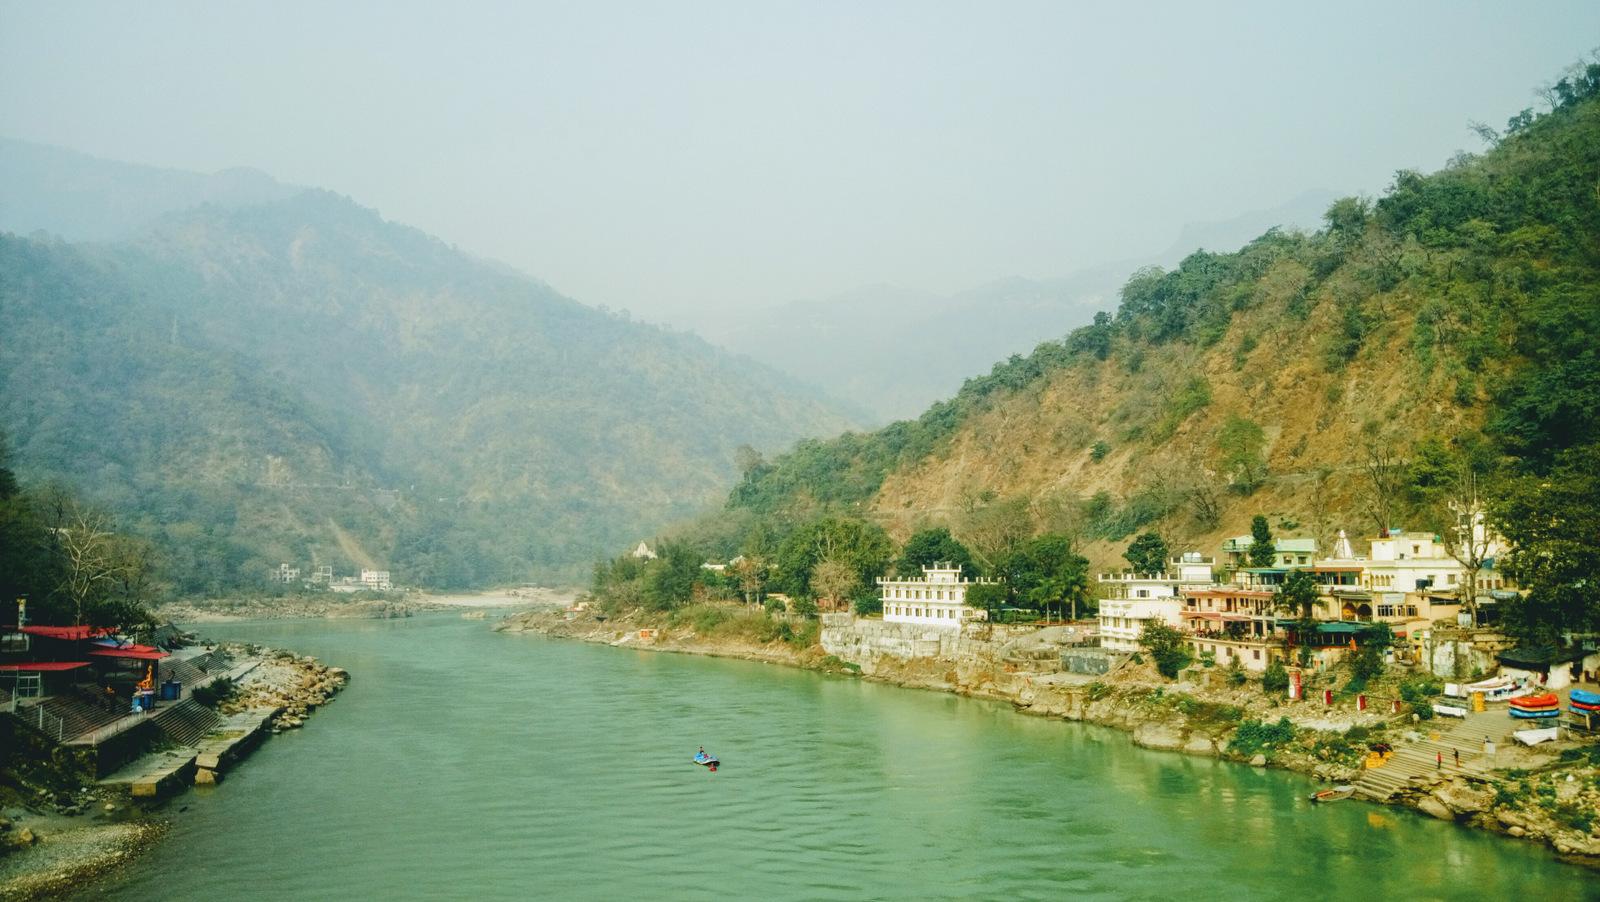 Laxman Jhula, Rishikesh, Uttarakhand, India